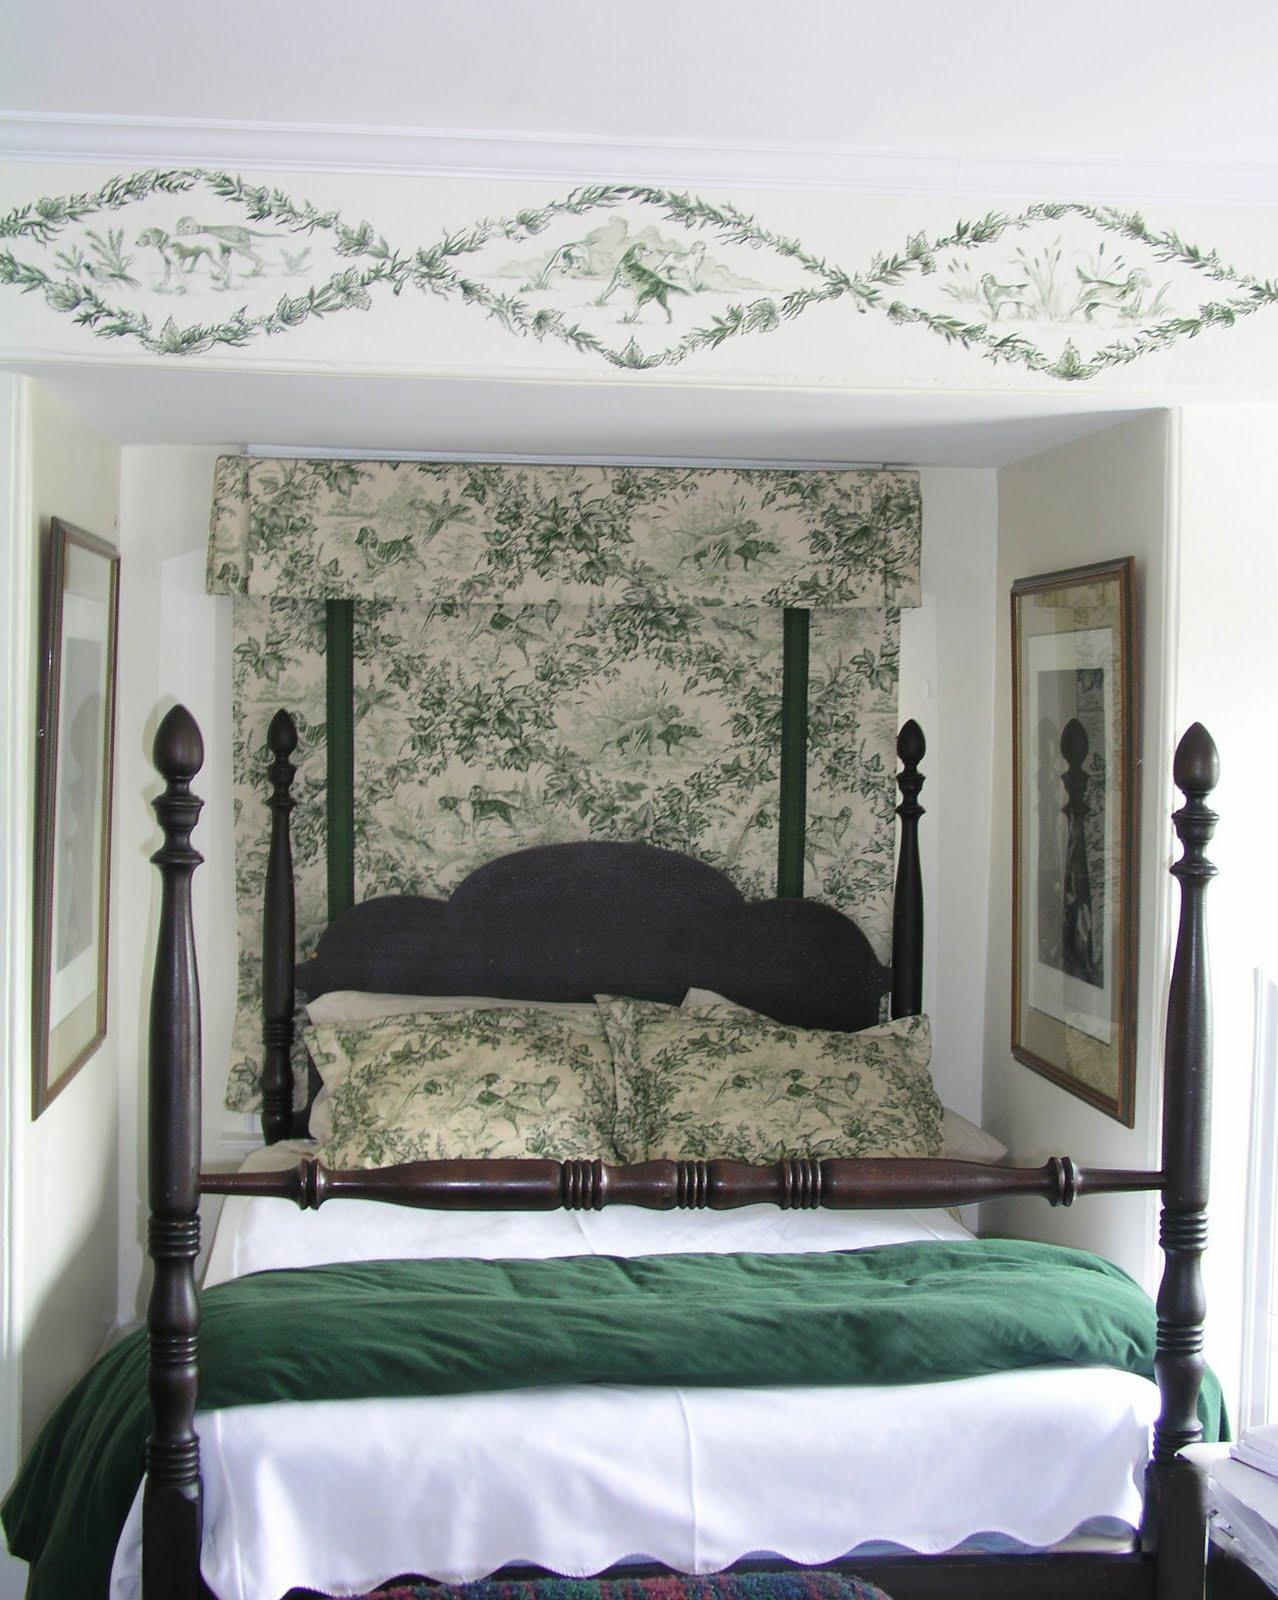 http://3.bp.blogspot.com/_kSroCbdNCC4/THQNGedbvAI/AAAAAAAADjk/NiPlT-Ni3bQ/s1600/Bed+alcove-1.JPG